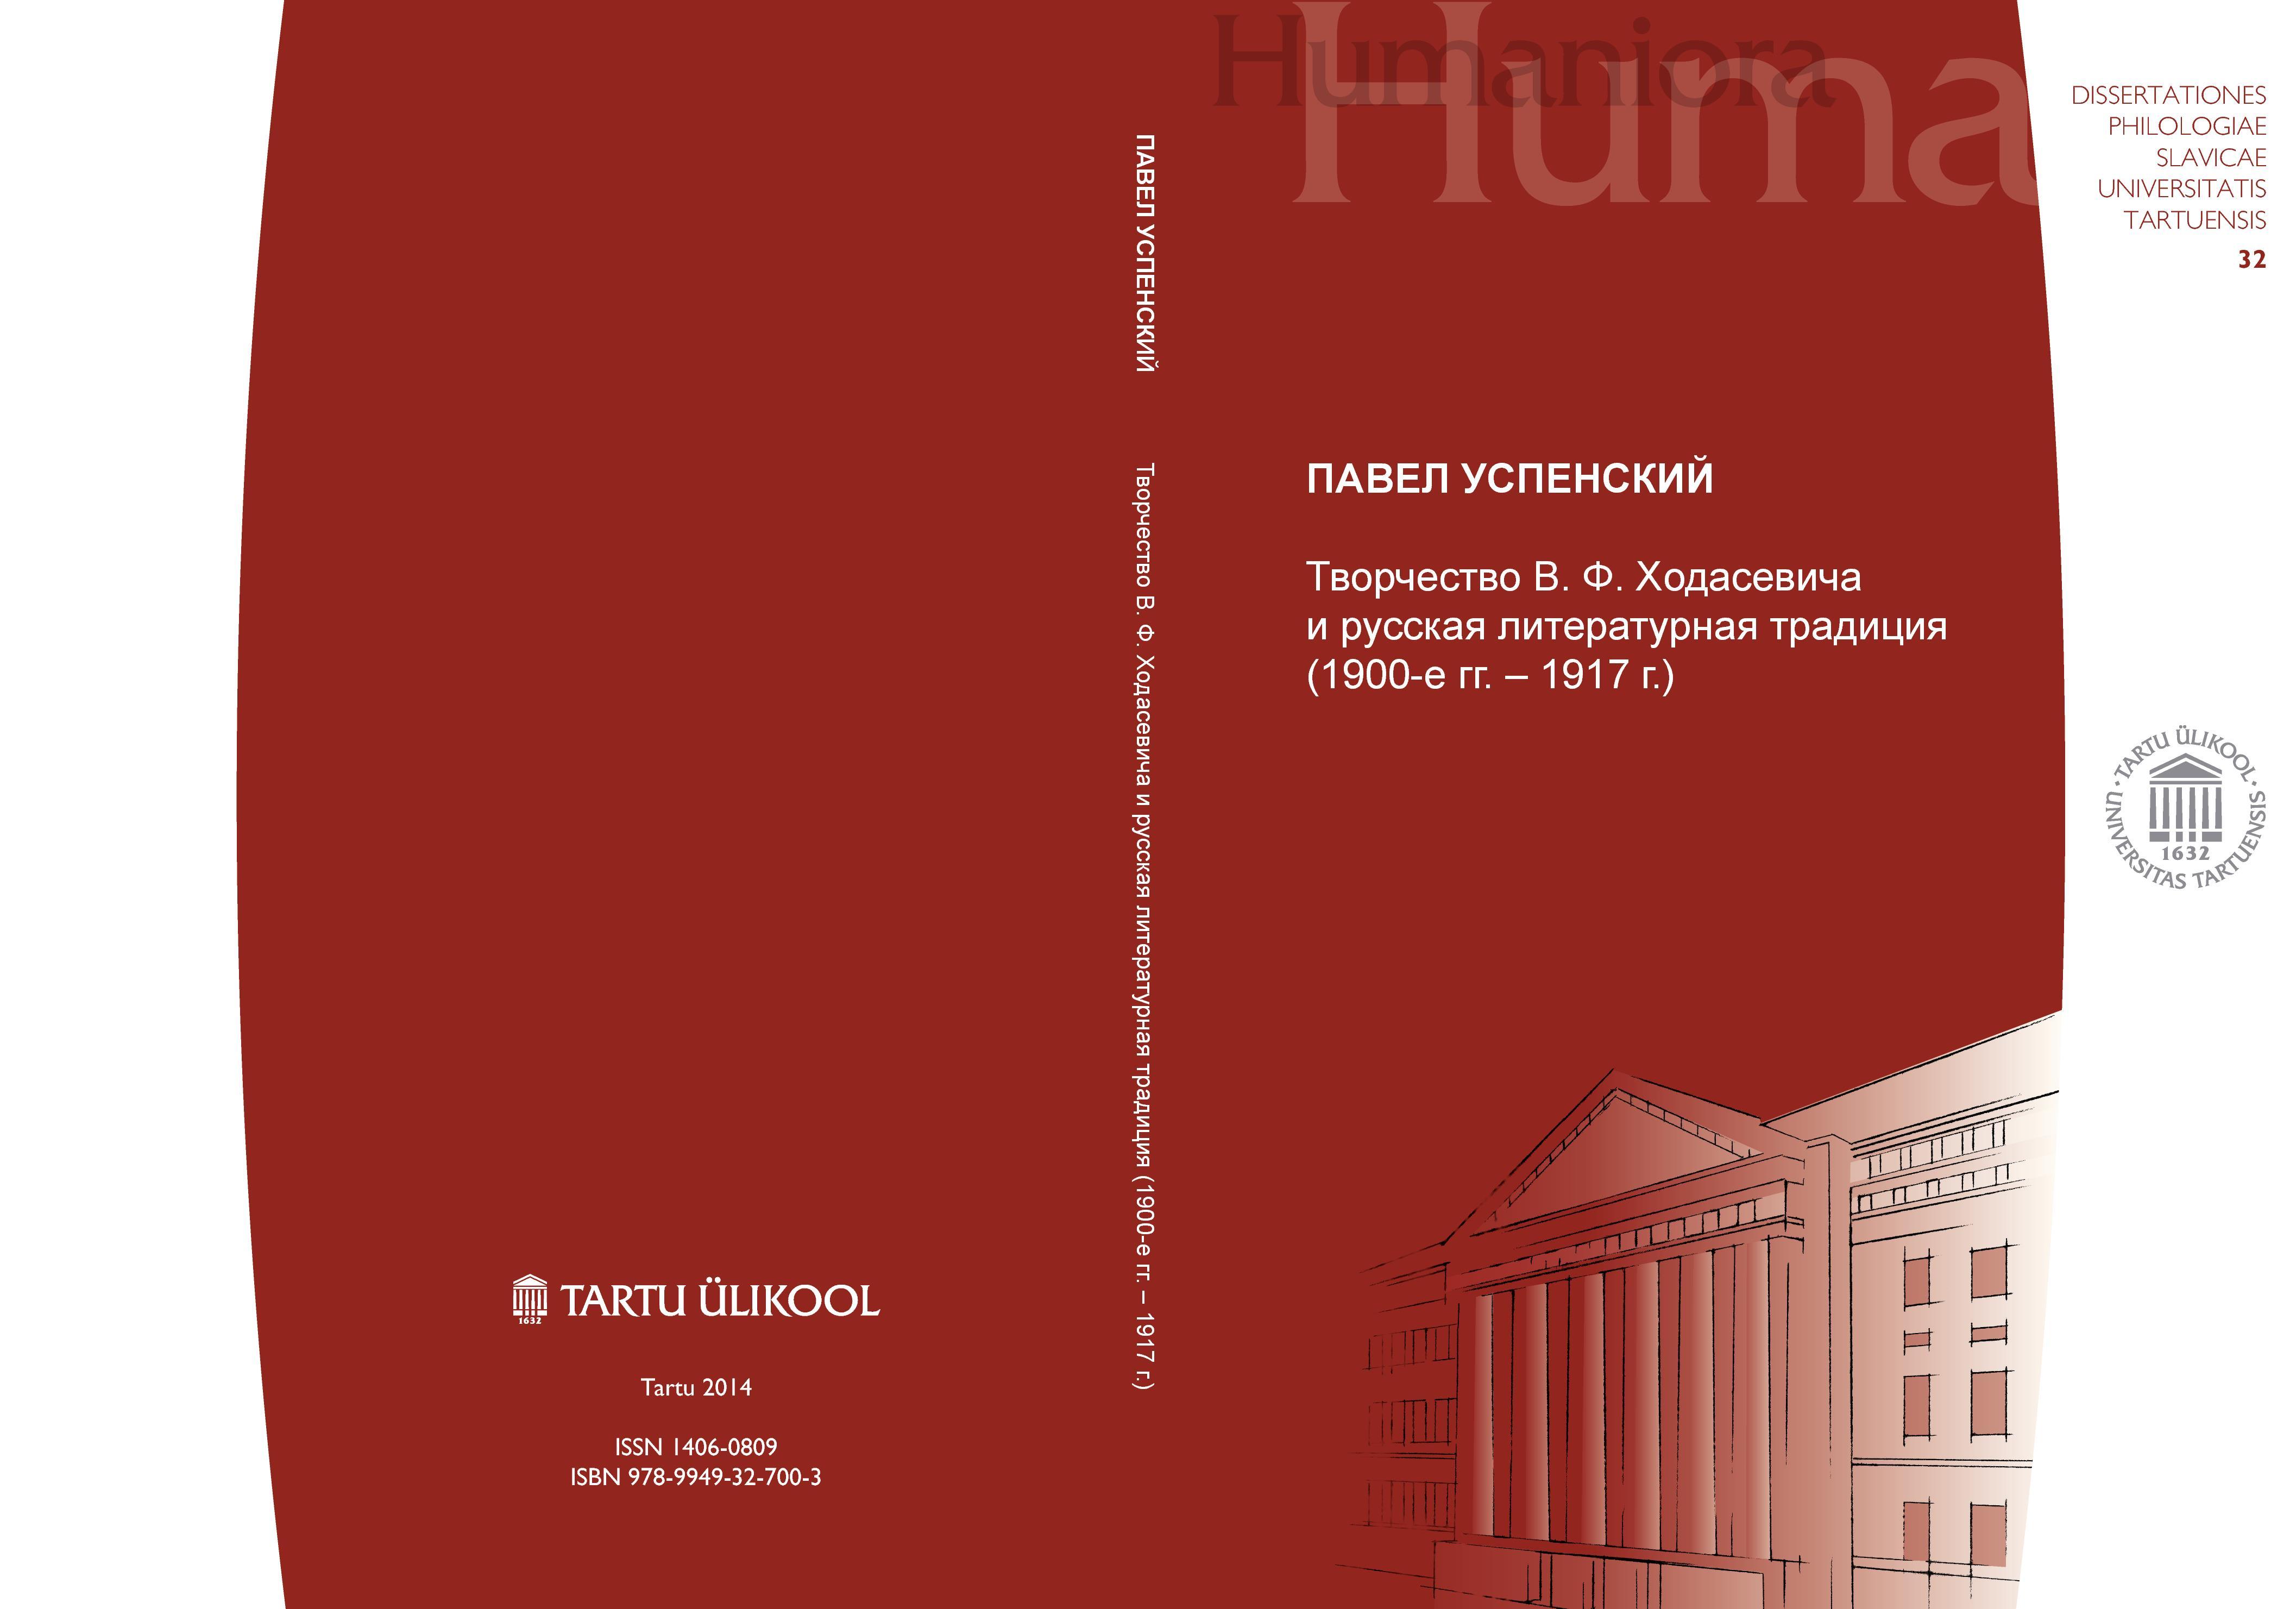 Творчество В. Ф. Ходасевича и русская литературная традиция (1900-е гг. - 1917 г.)